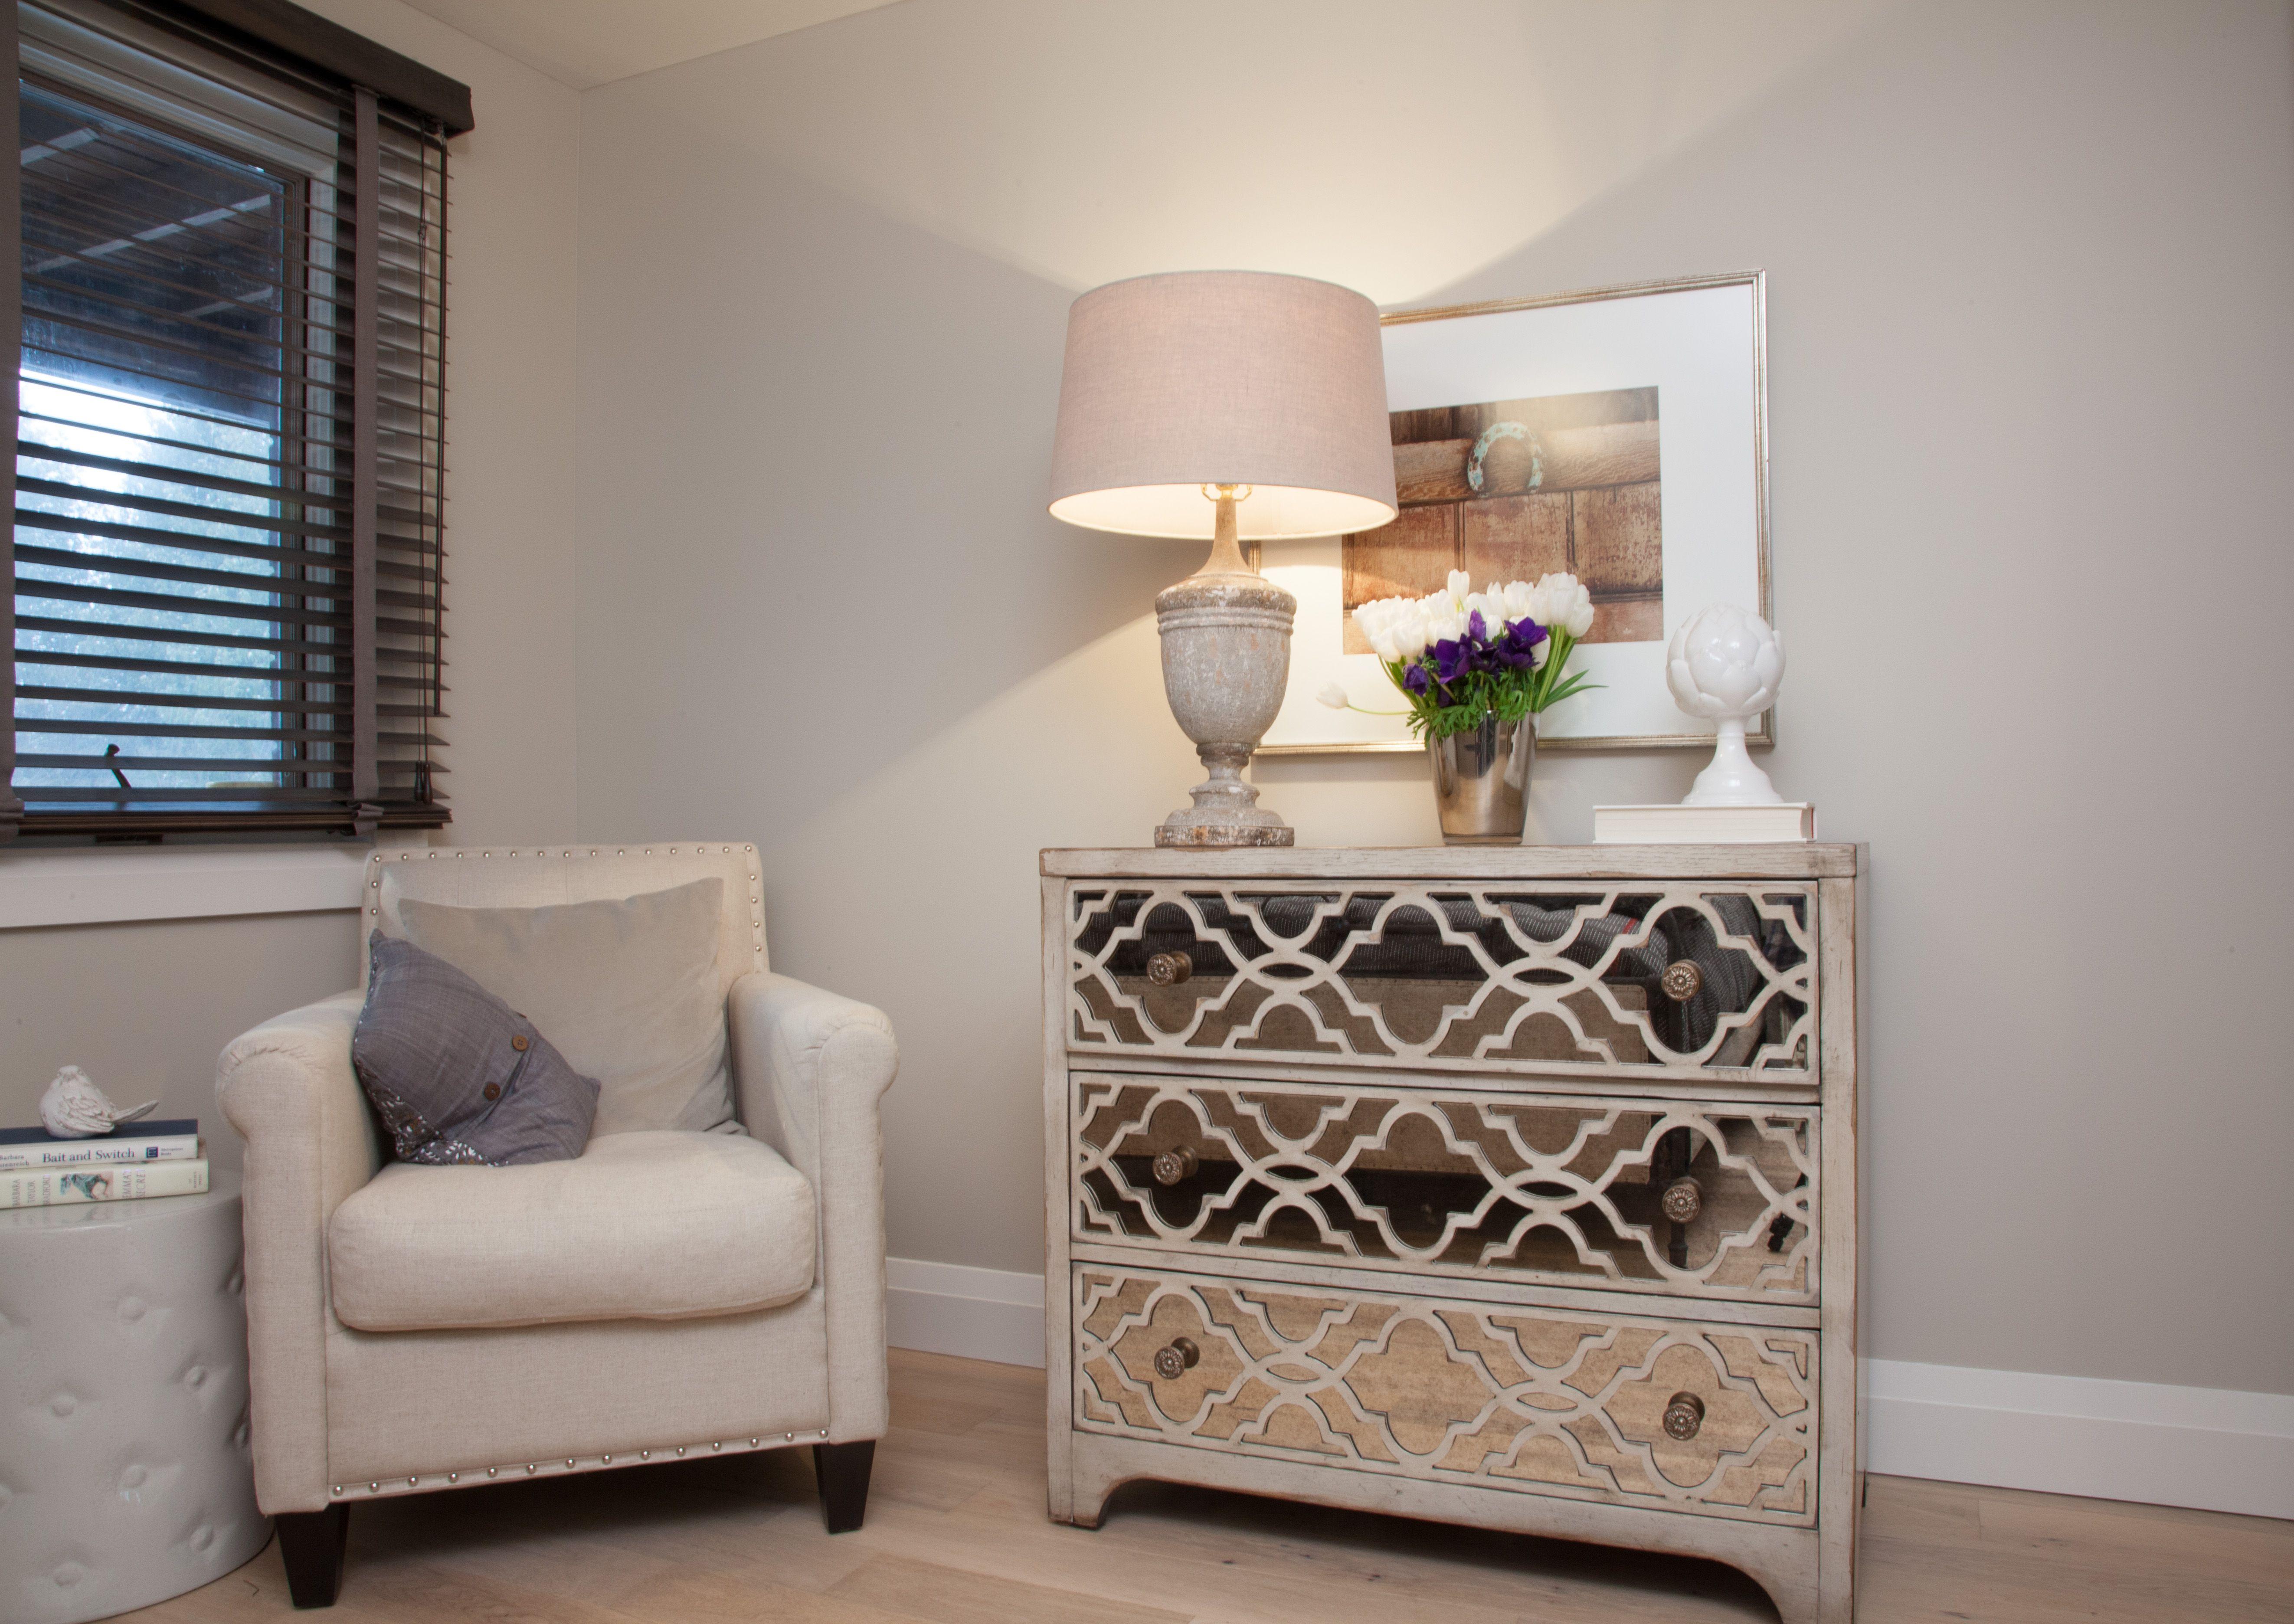 Property Bedroom decor, Home decor, Interior